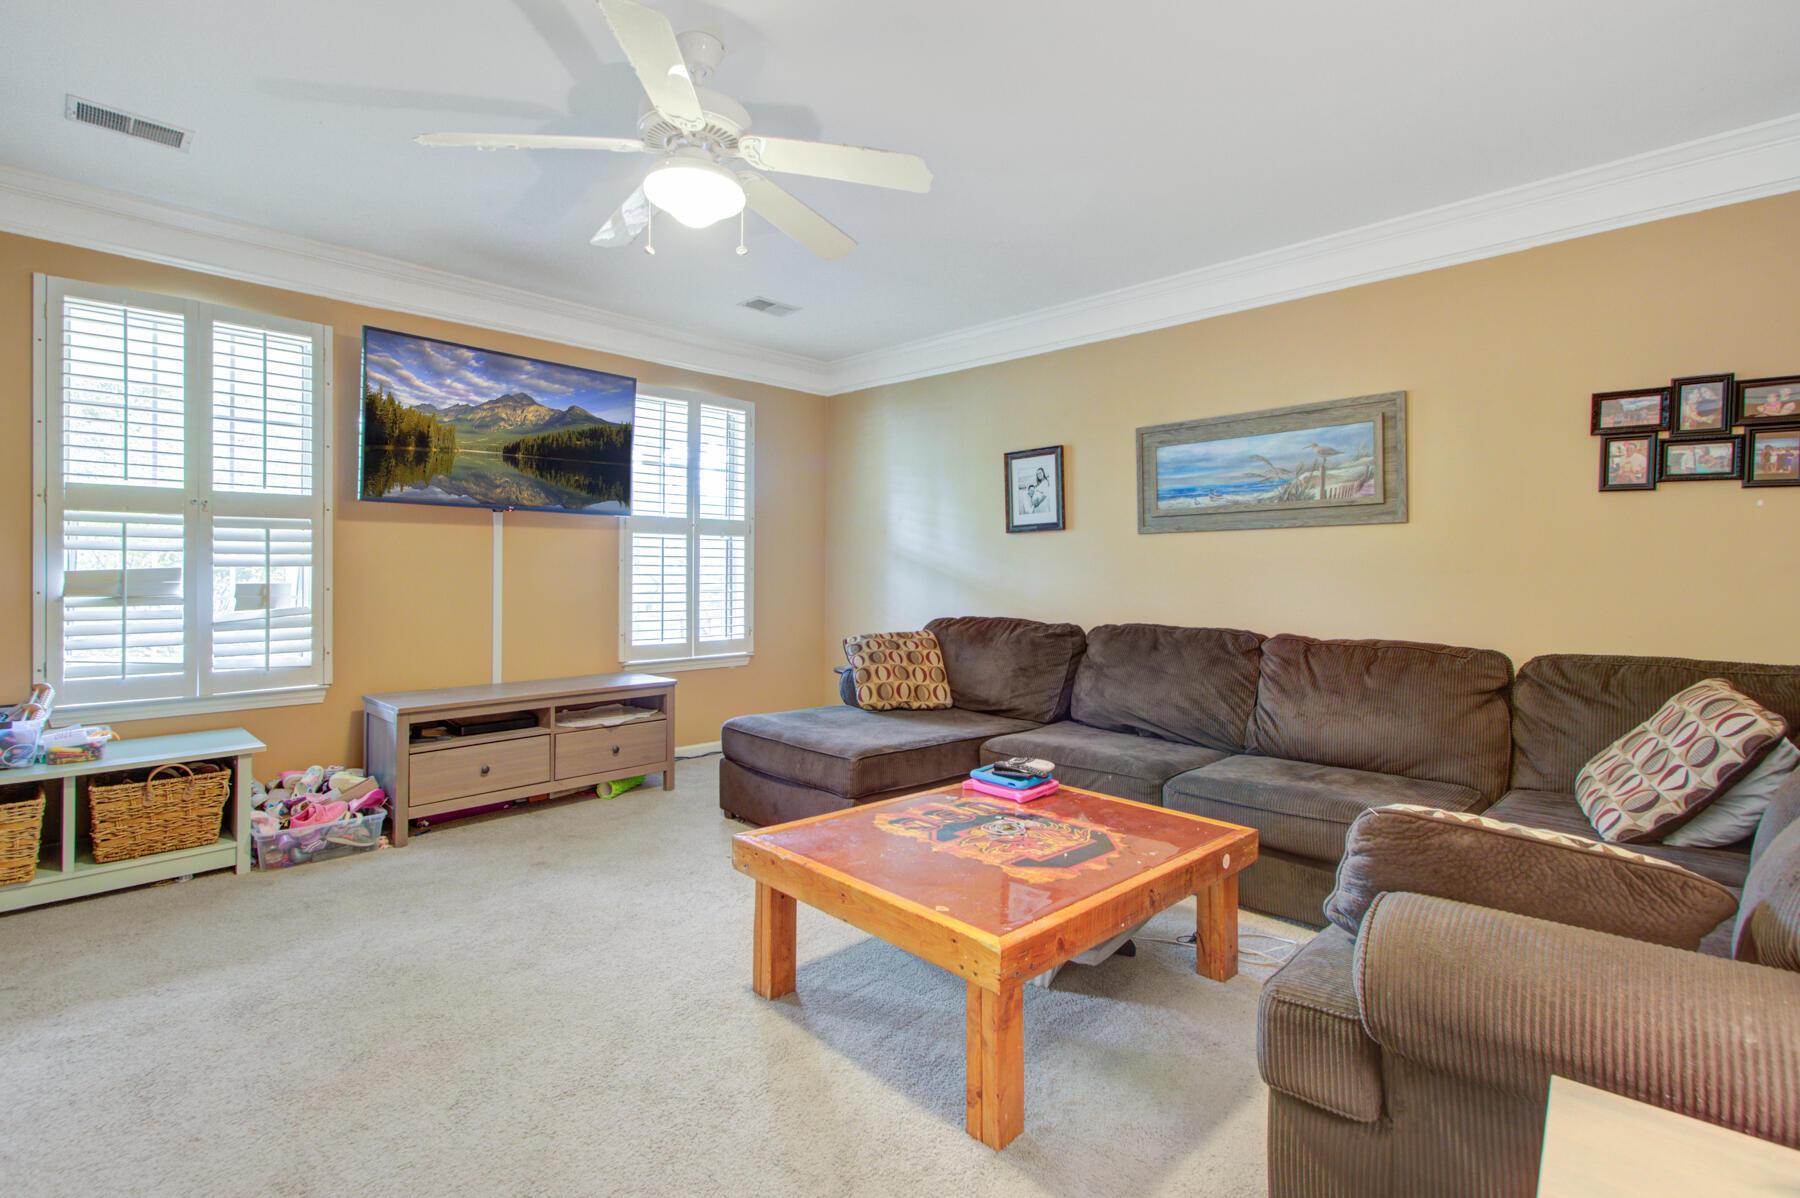 Dunes West Homes For Sale - 2232 Kings Gate, Mount Pleasant, SC - 21